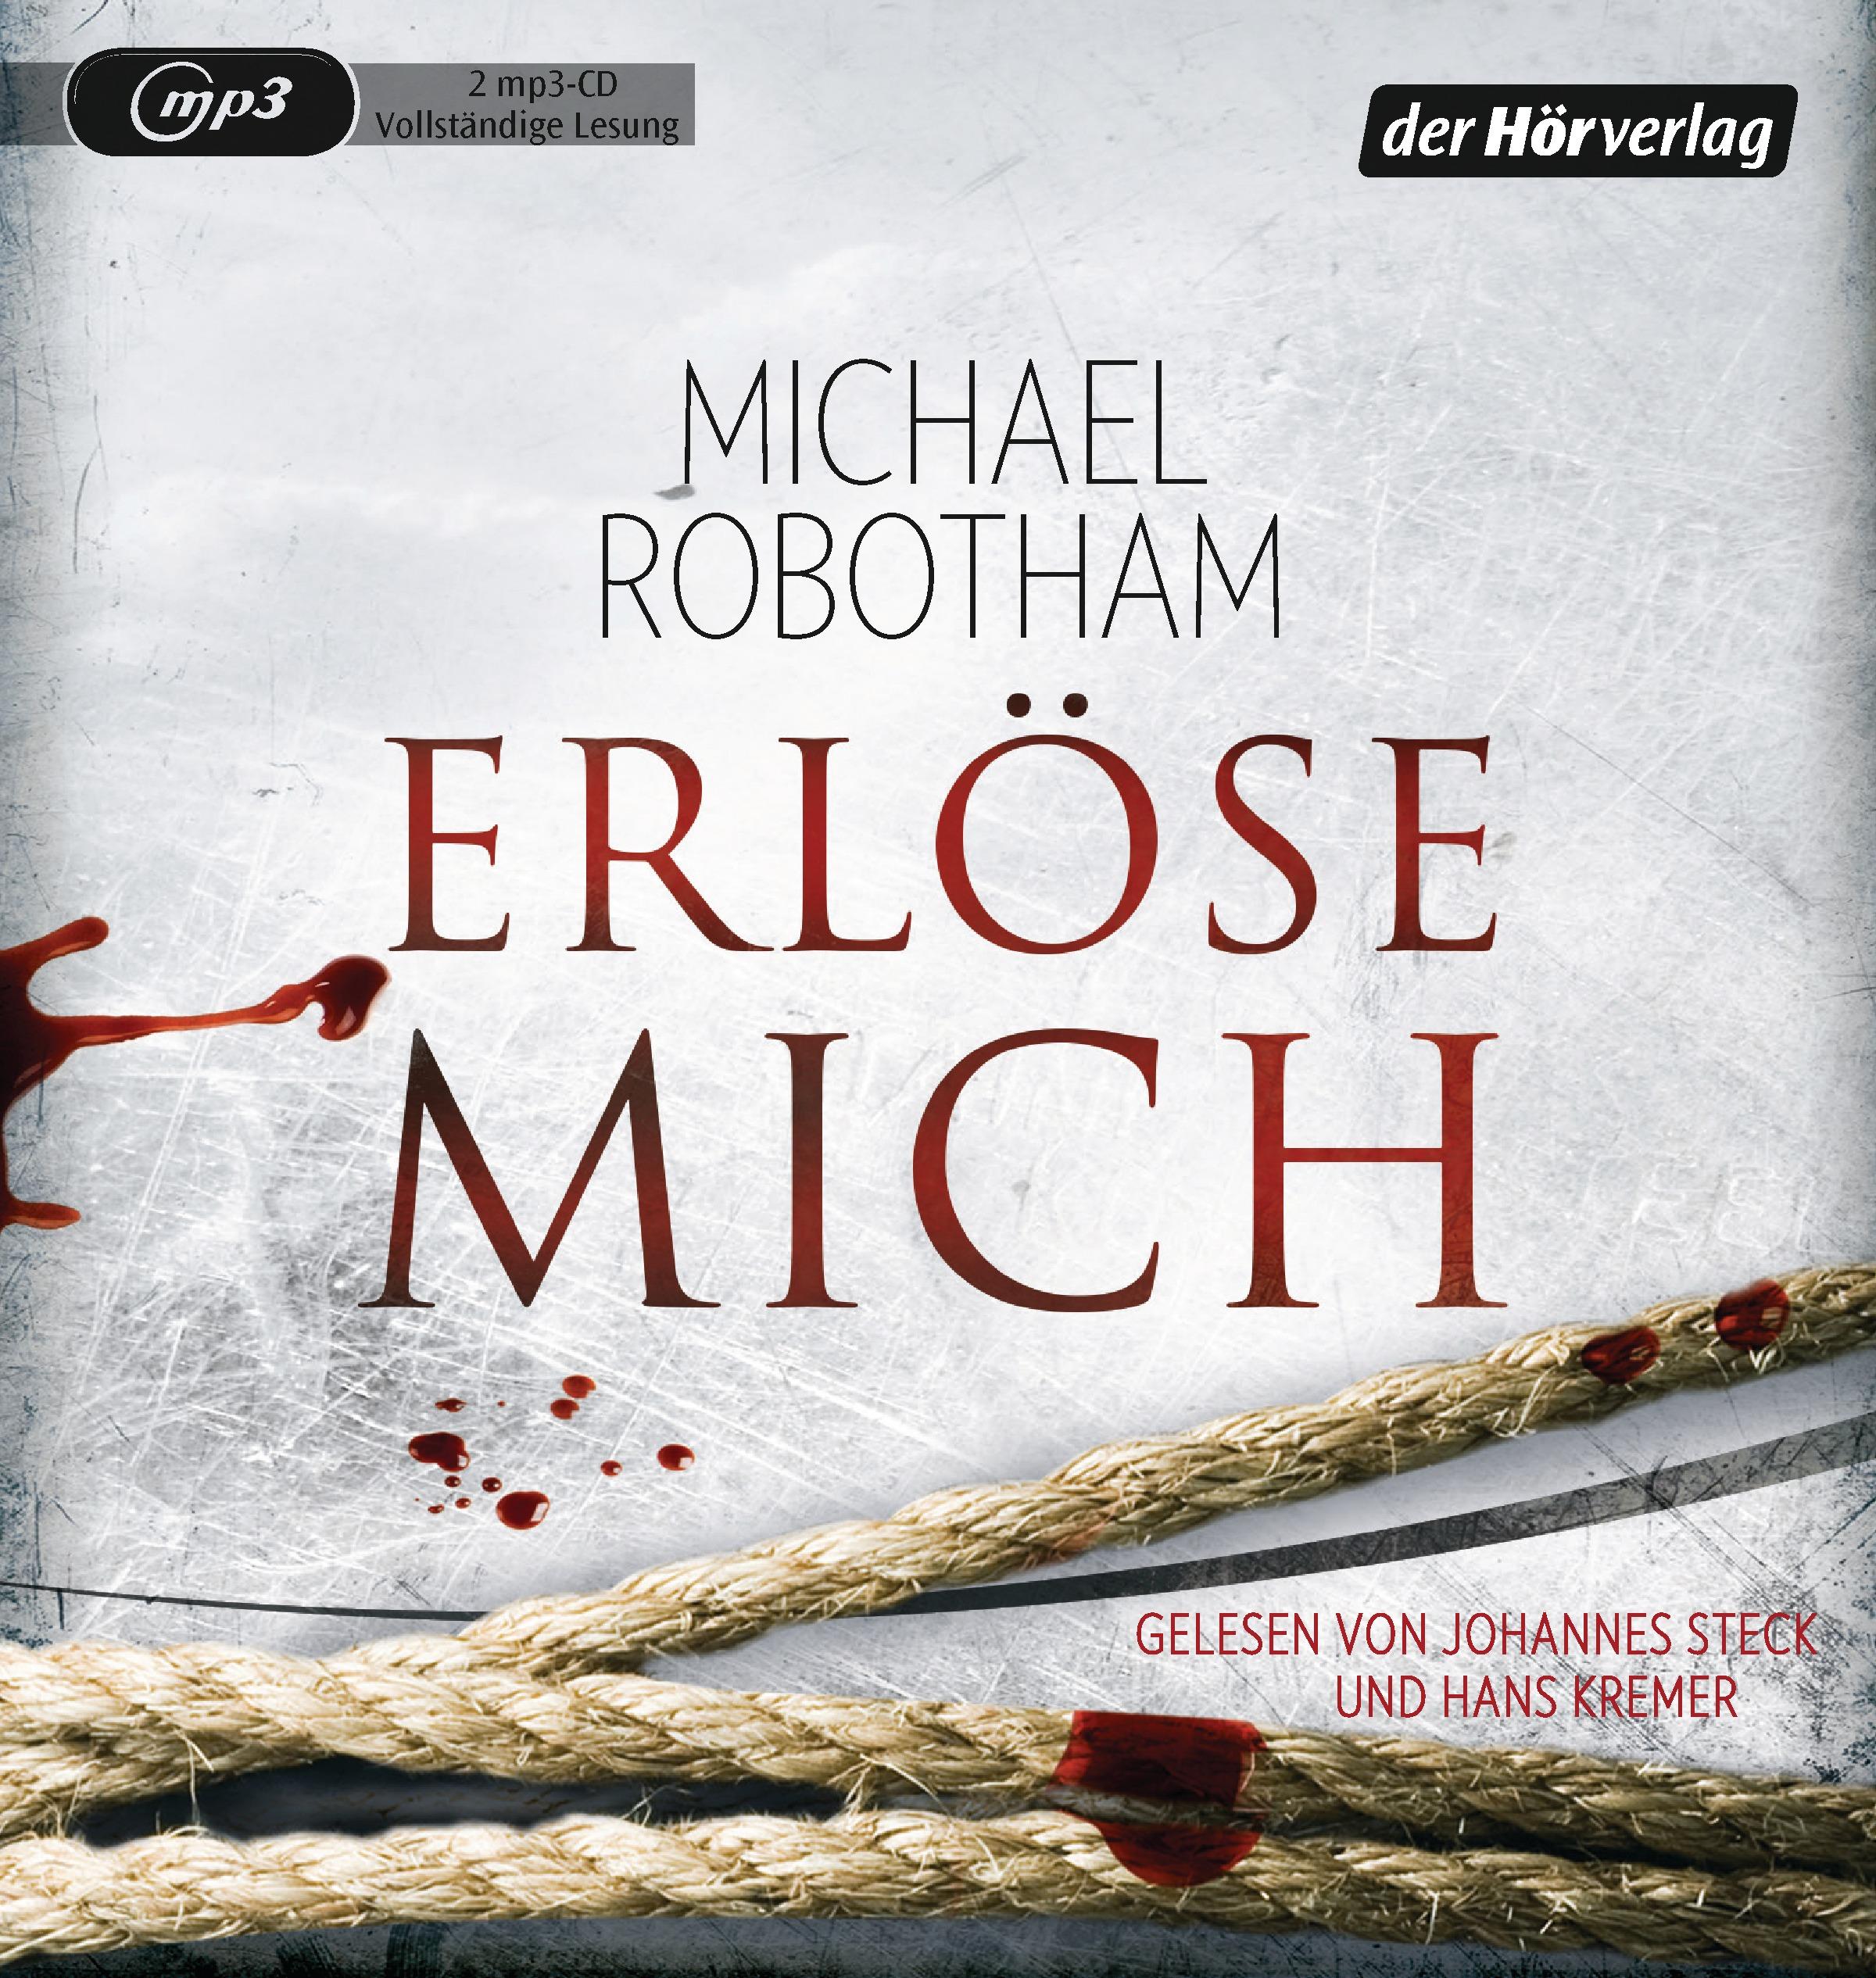 Erlöse mich - Michael Robotham [2mp3-CDs; unkek...